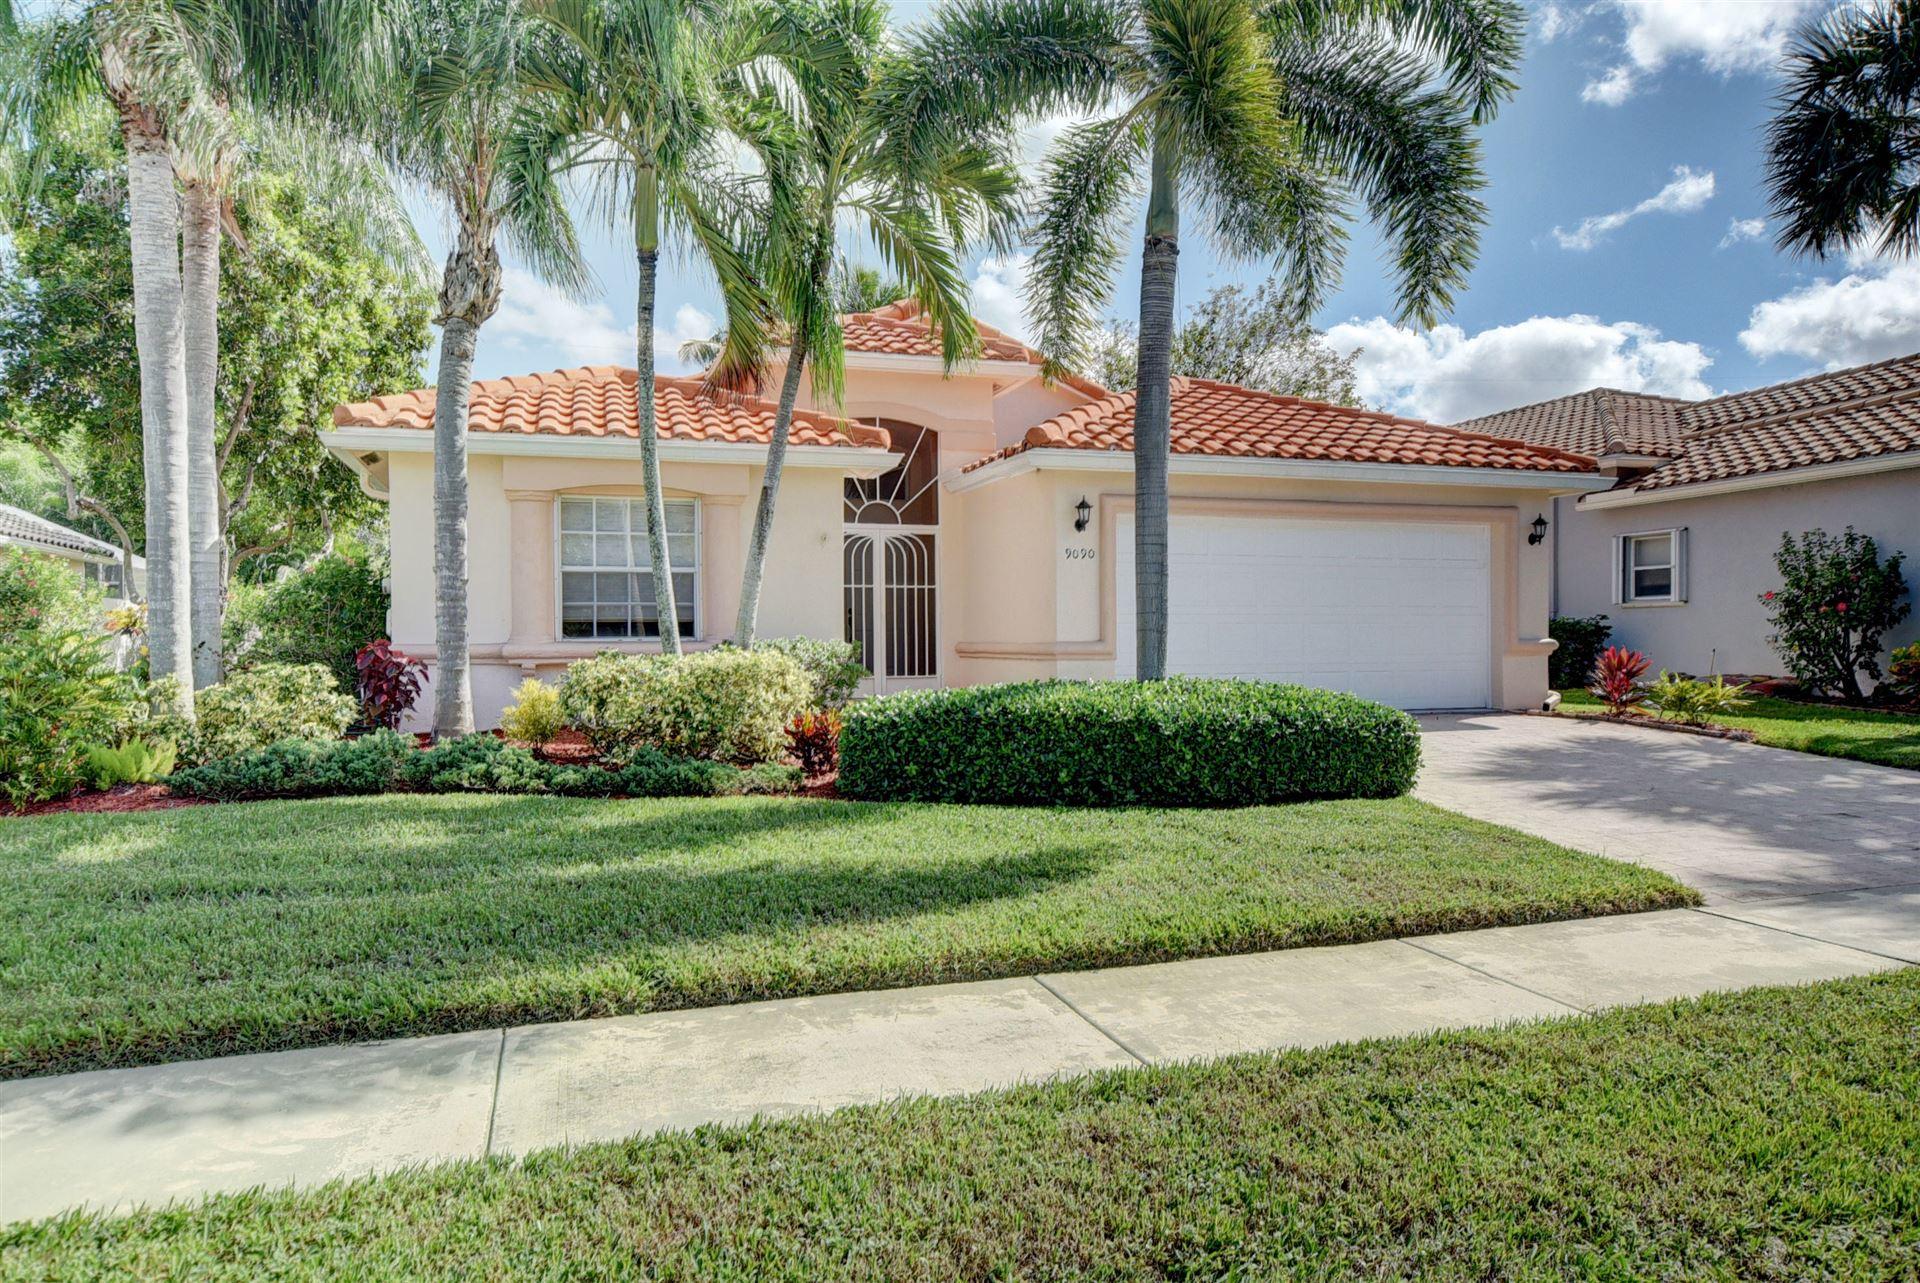 9090 Padova Drive, Boynton Beach, FL 33472 - #: RX-10668486